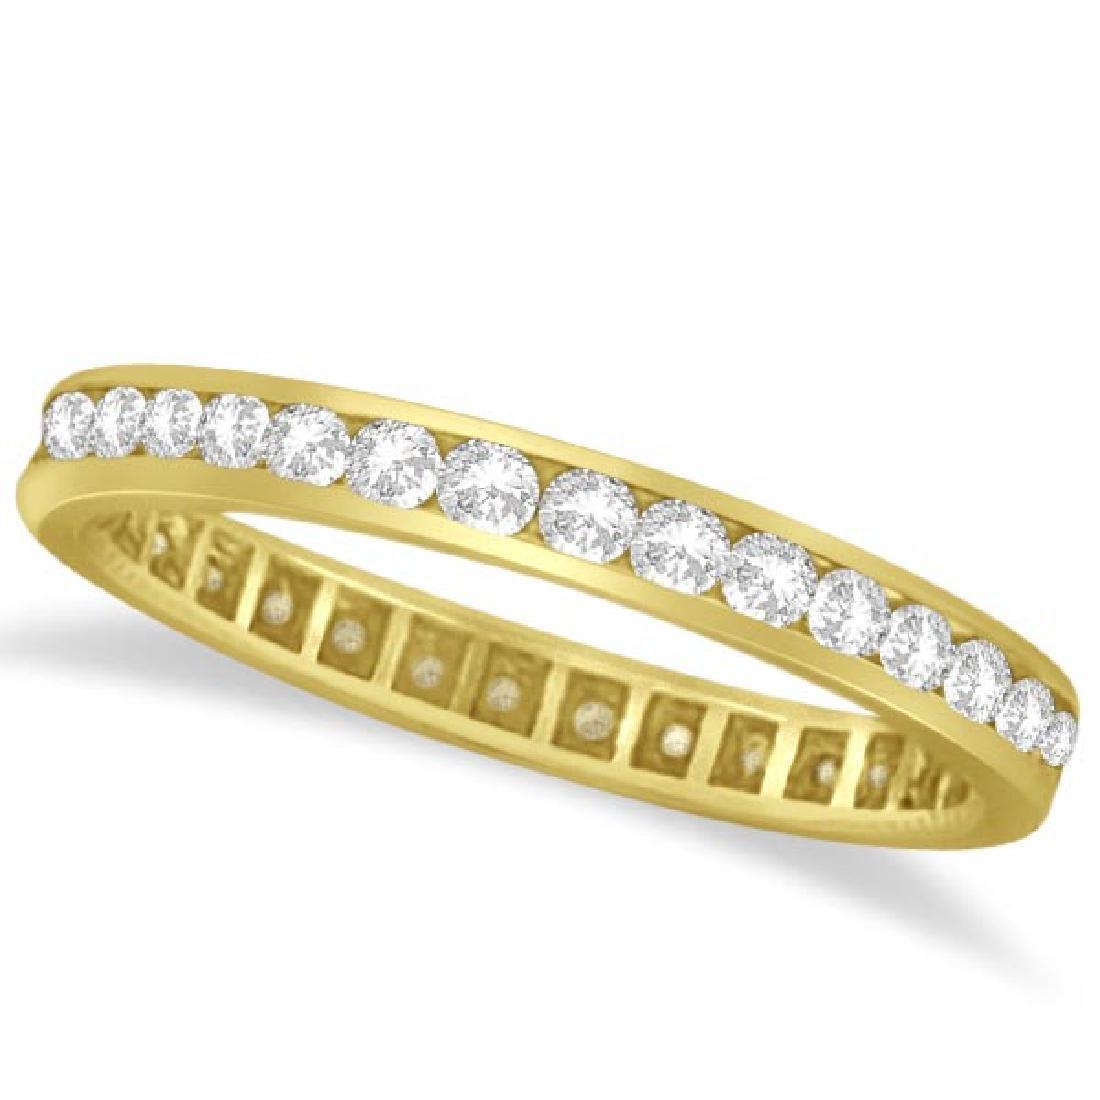 Channel Set Diamond Eternity Ring Band 14k Yellow Gold